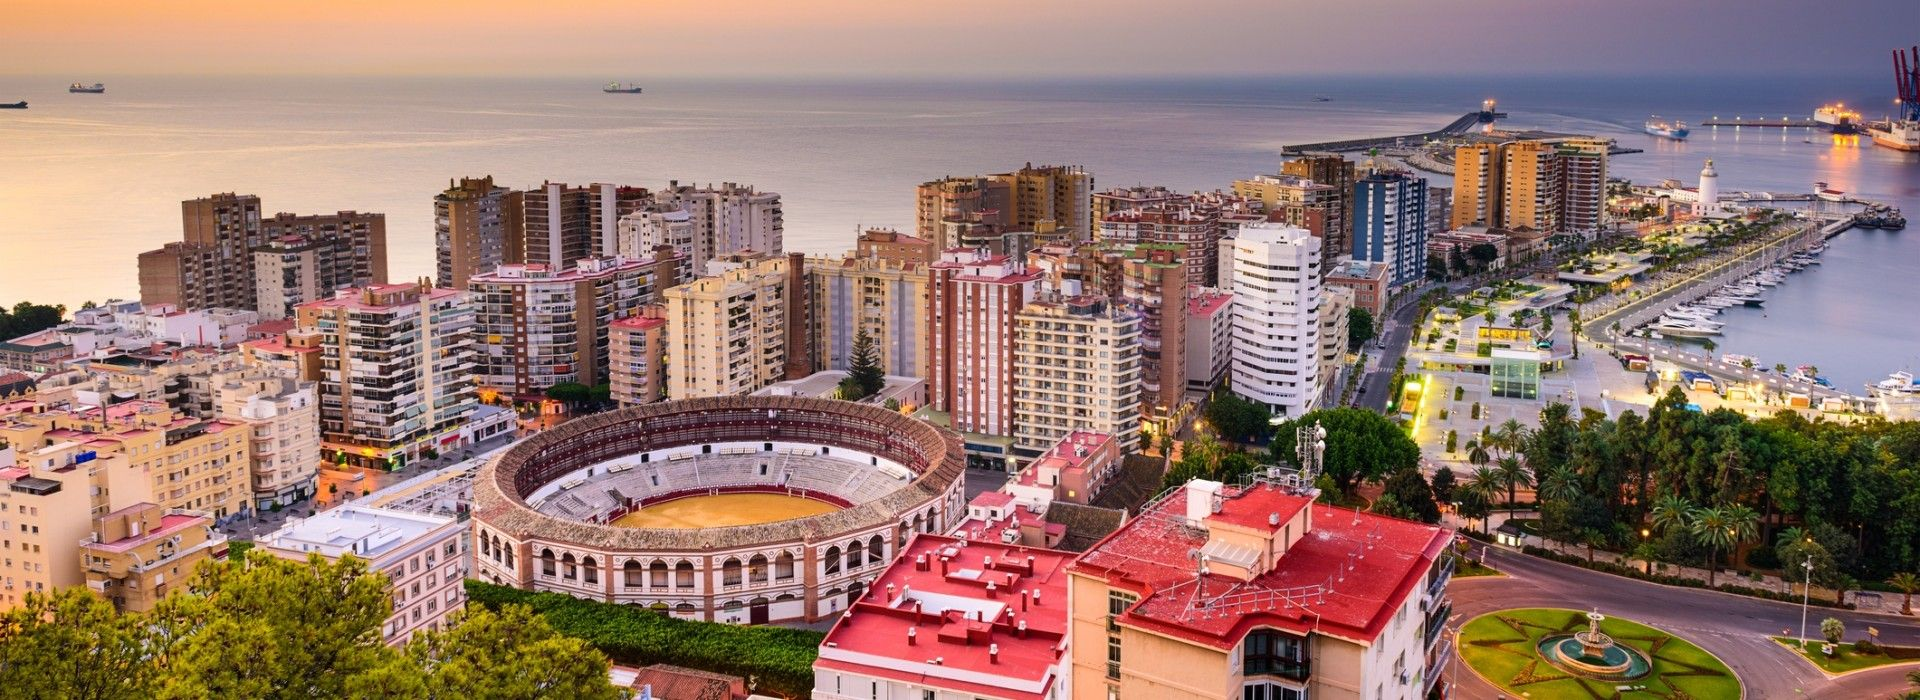 Malaga Tours and Holidays 2018/2019